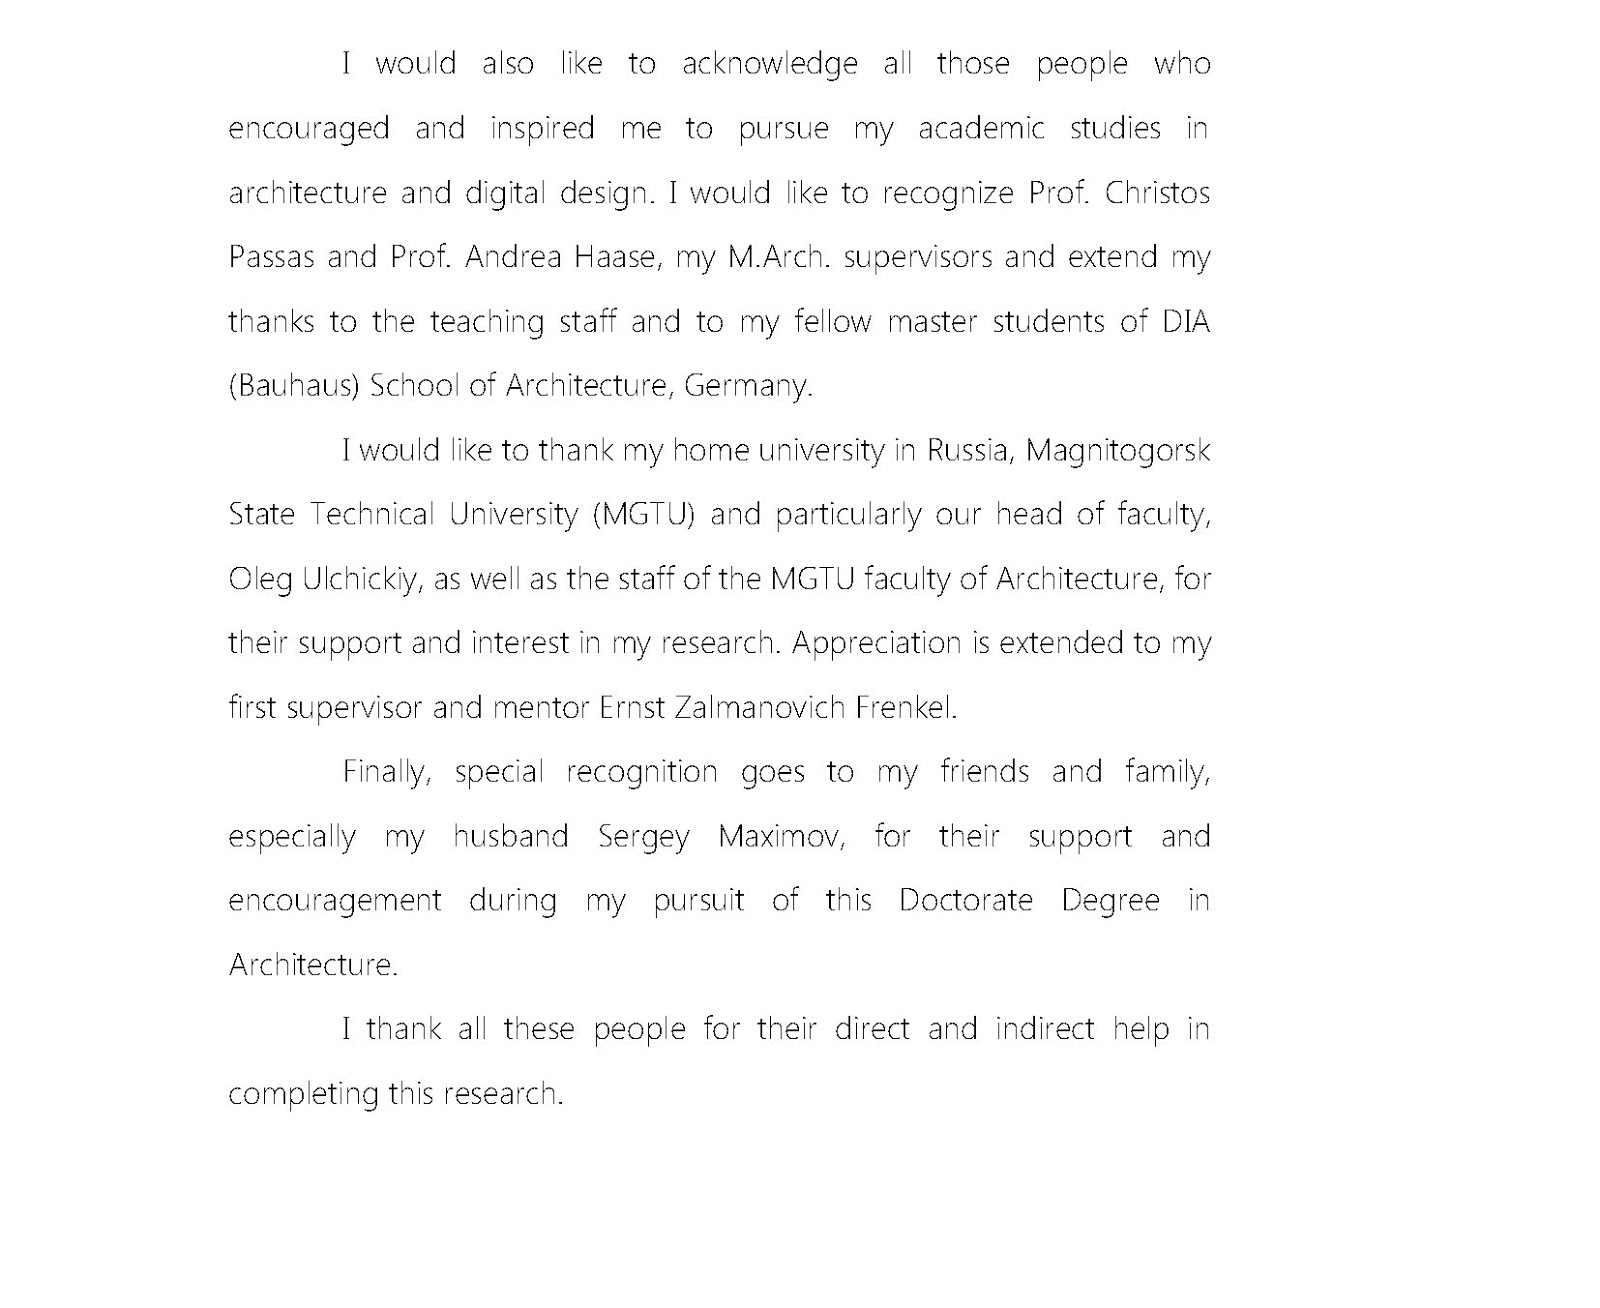 Acknowledgement Dissertation Who Encouraged